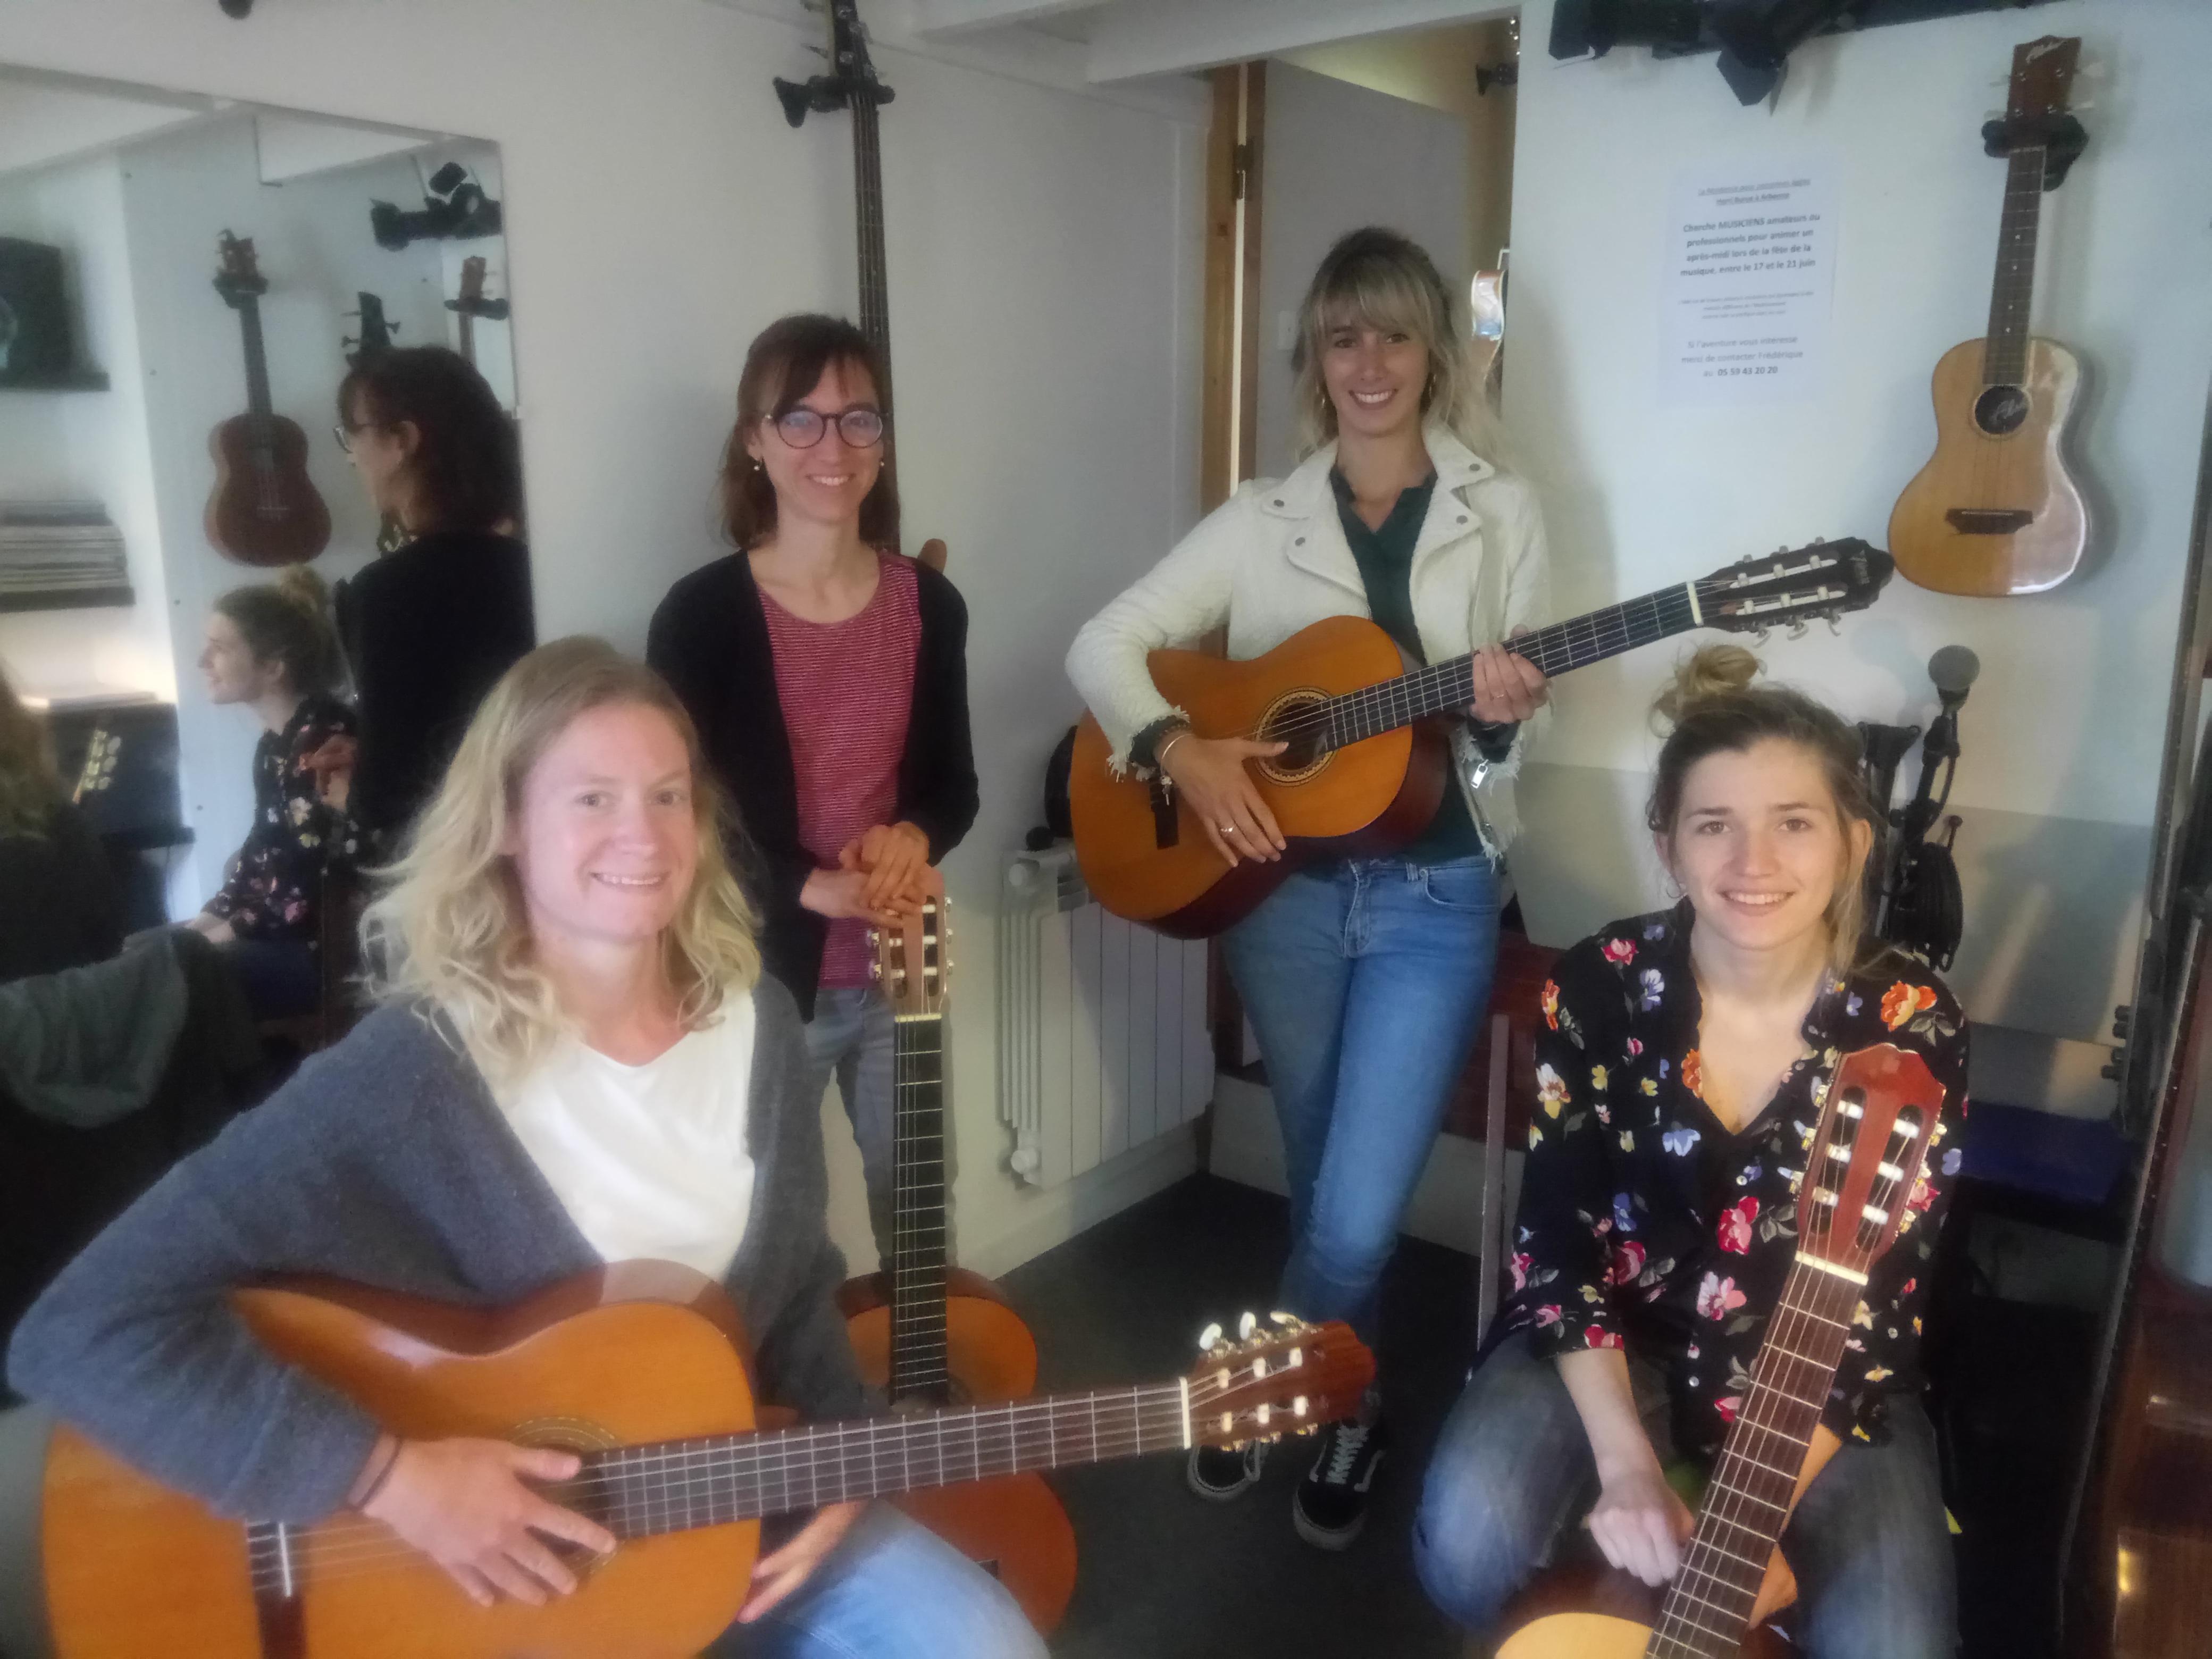 Eva, Julie, Jeanne et Laure